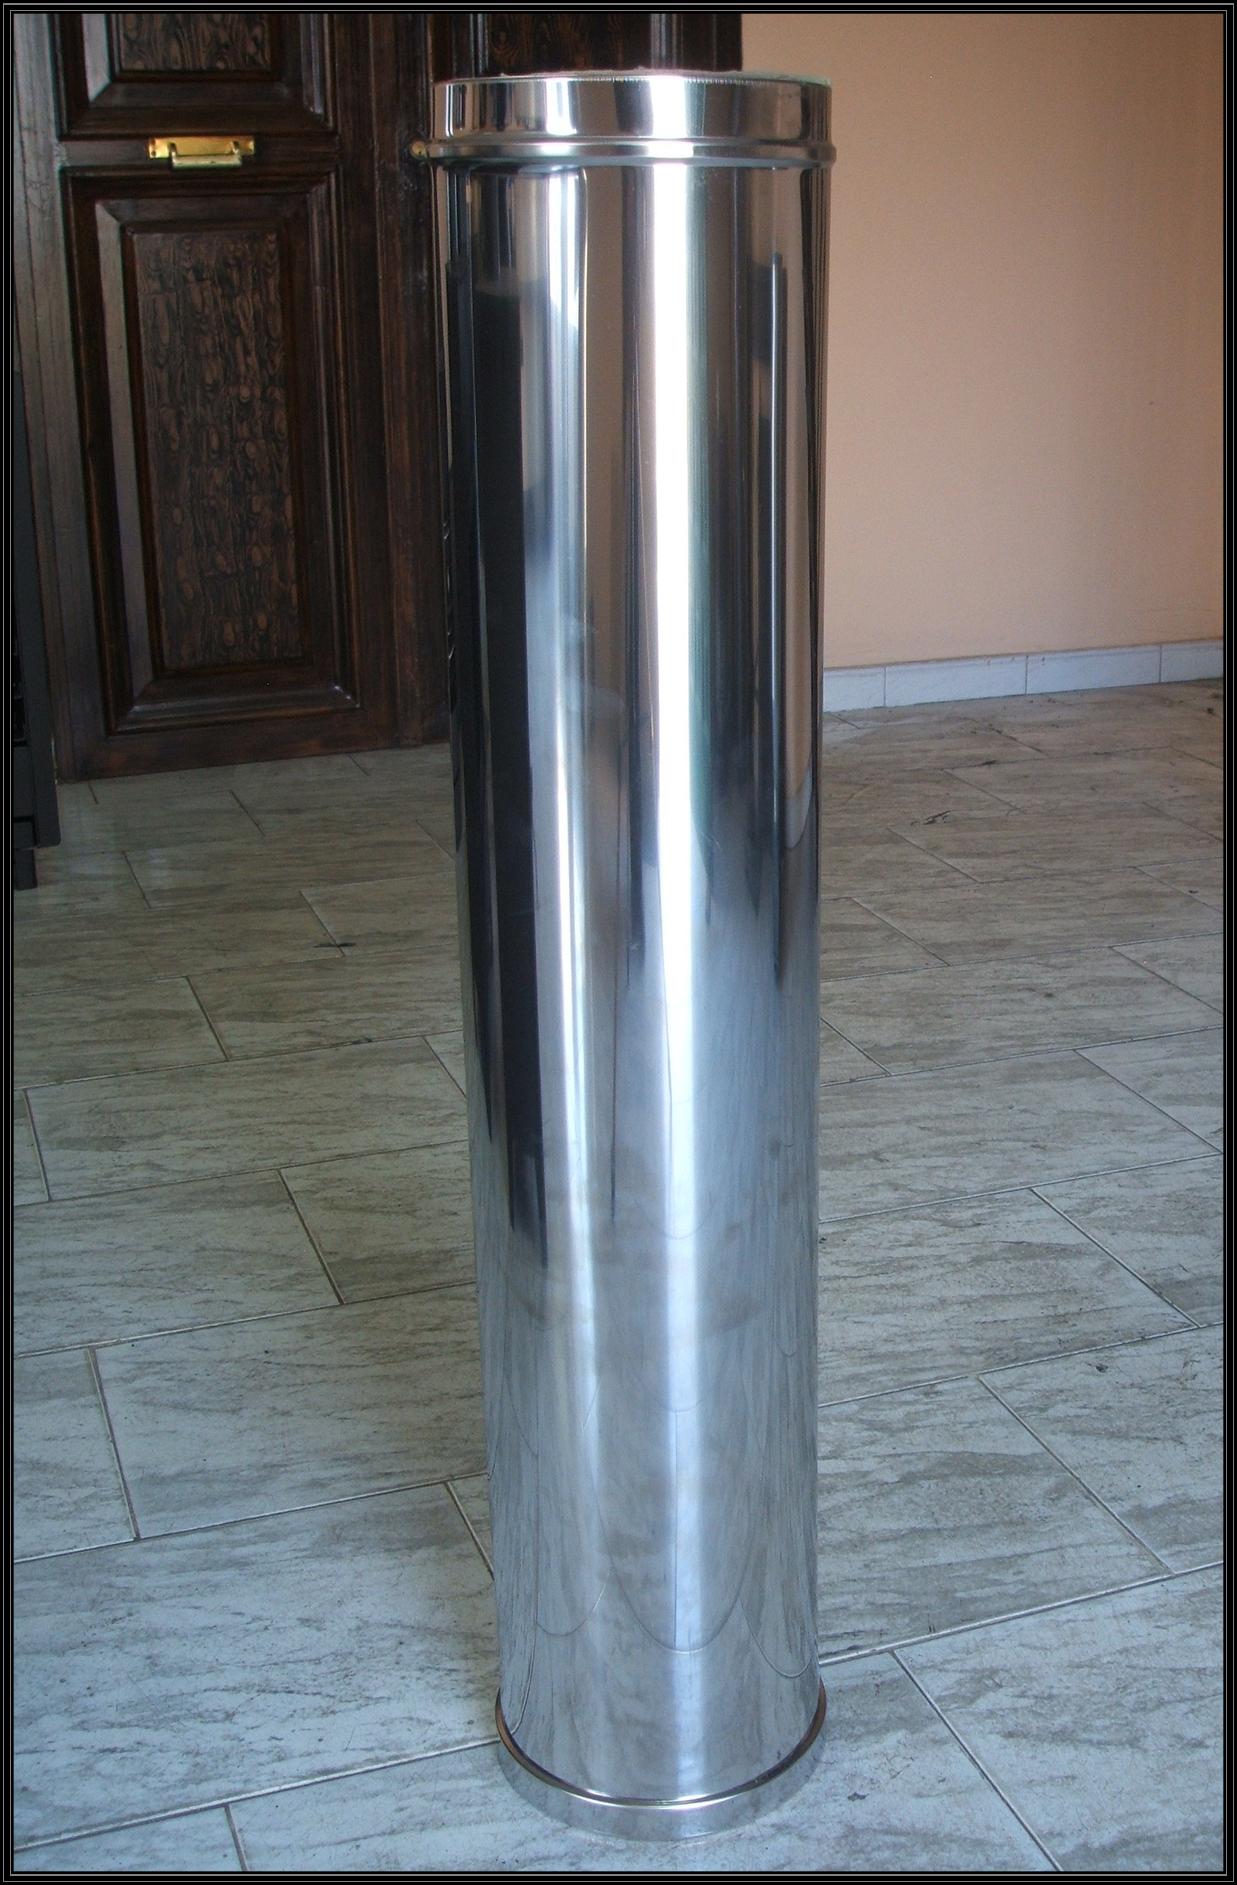 Chimeneas sierra tubo de doble pared - Tubos de acero inoxidable para chimeneas ...